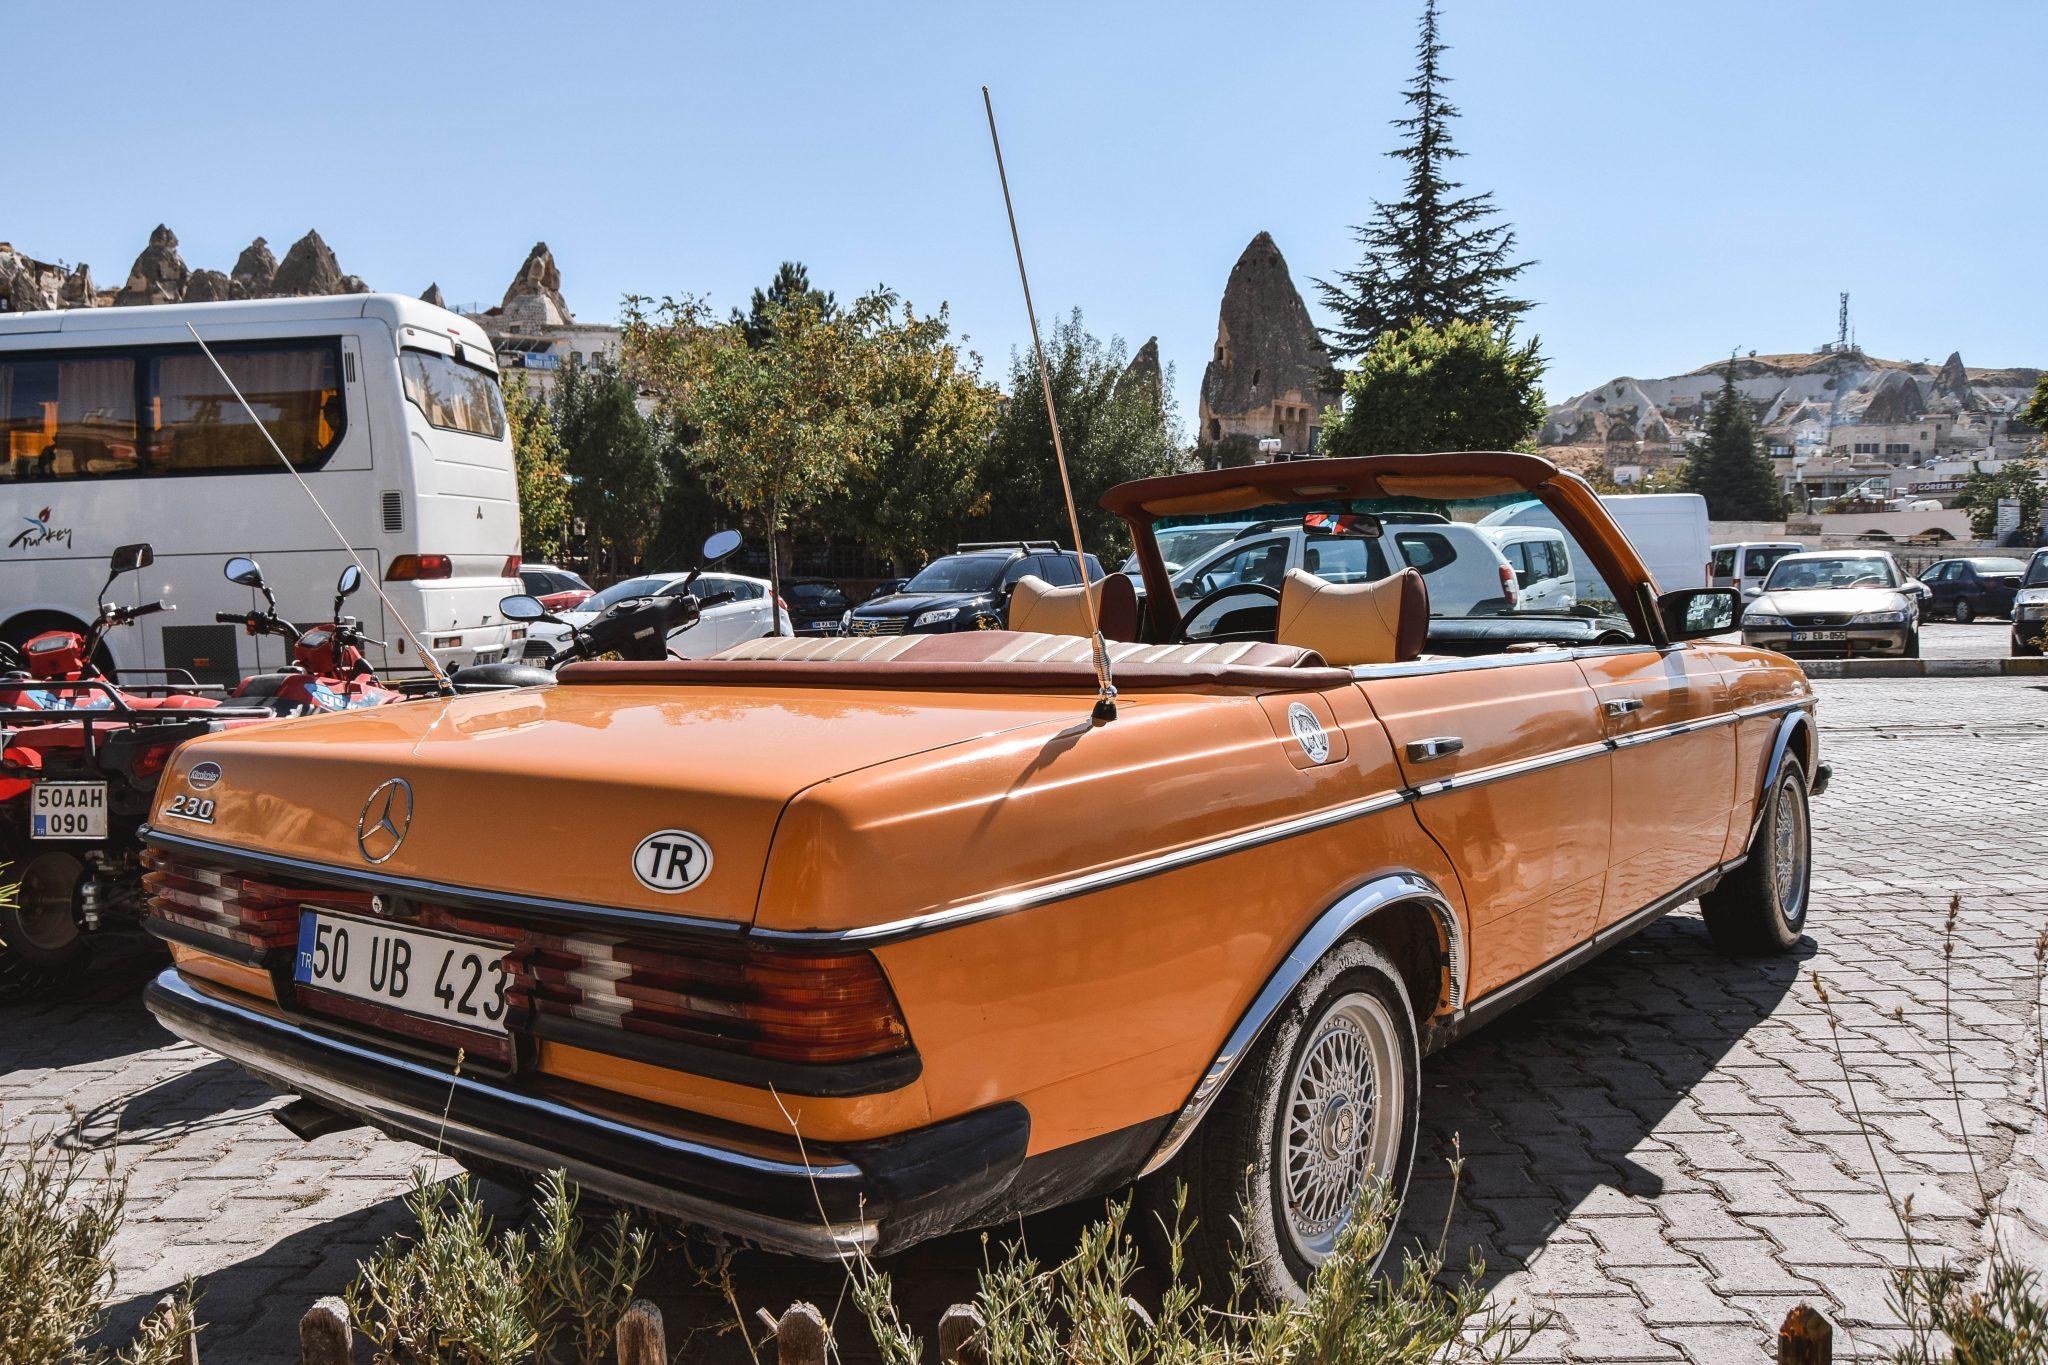 Wanderers & Warriors - Things To Do In Cappadocia Classic Car Tour Cappadocia